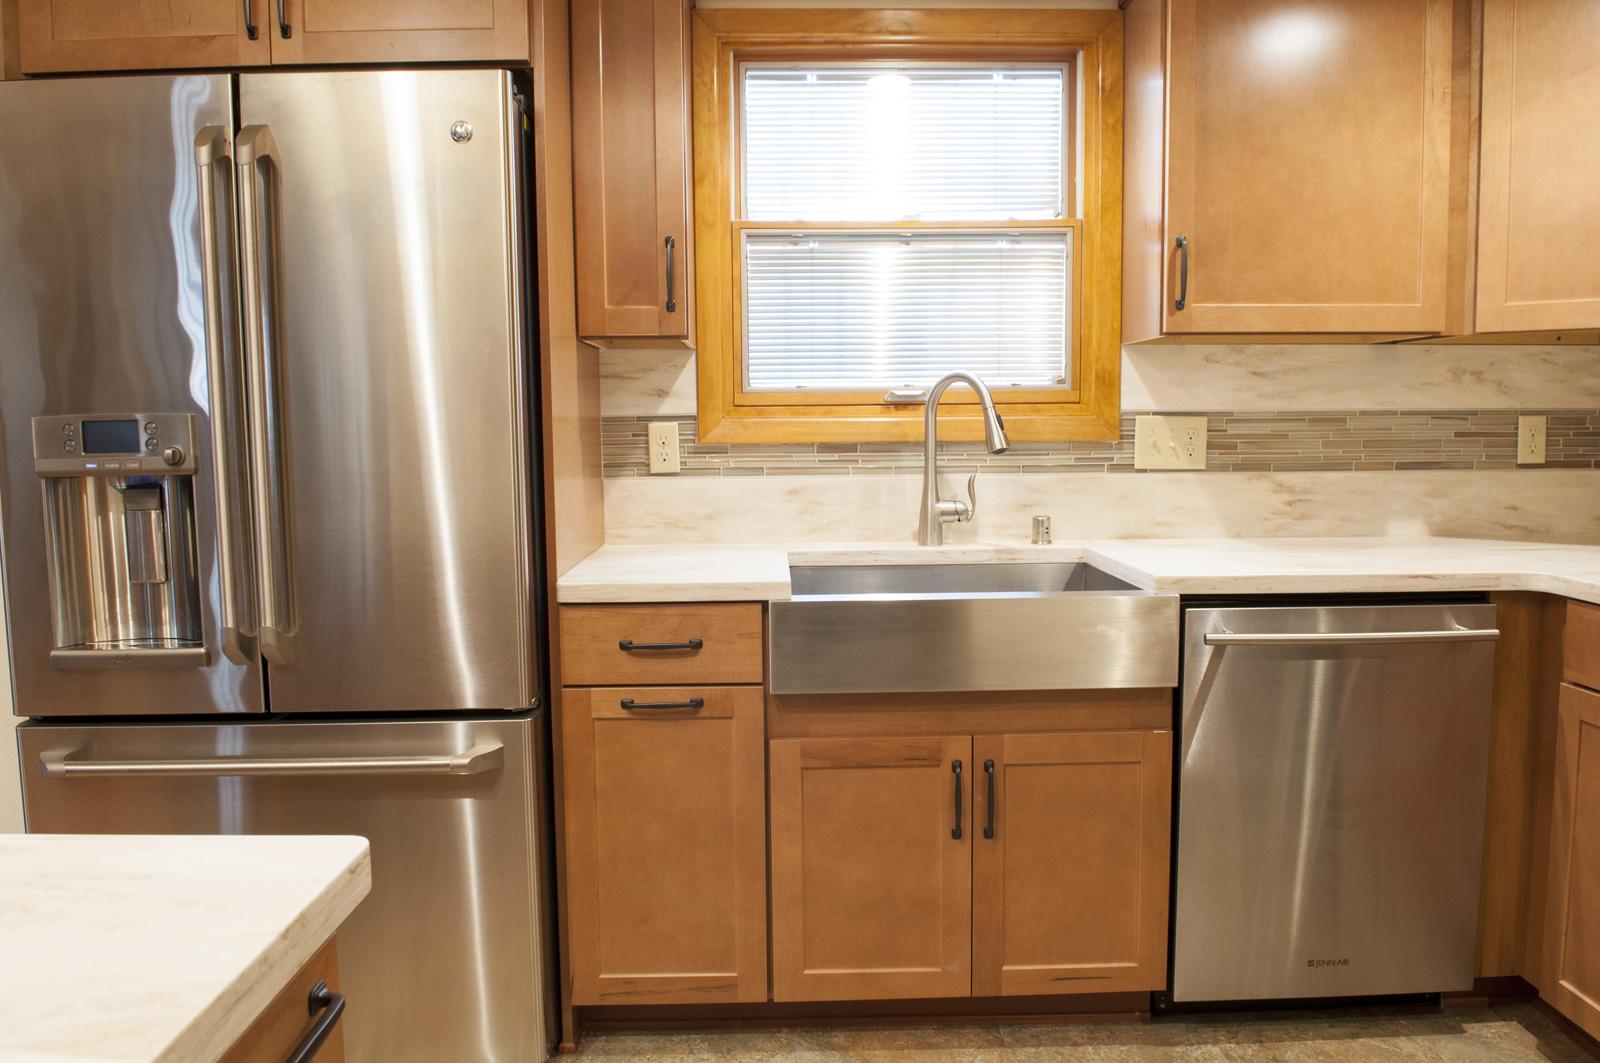 Kitchen Remodeling - 5 Day Kitchens and Santa Fe Kitchens ...